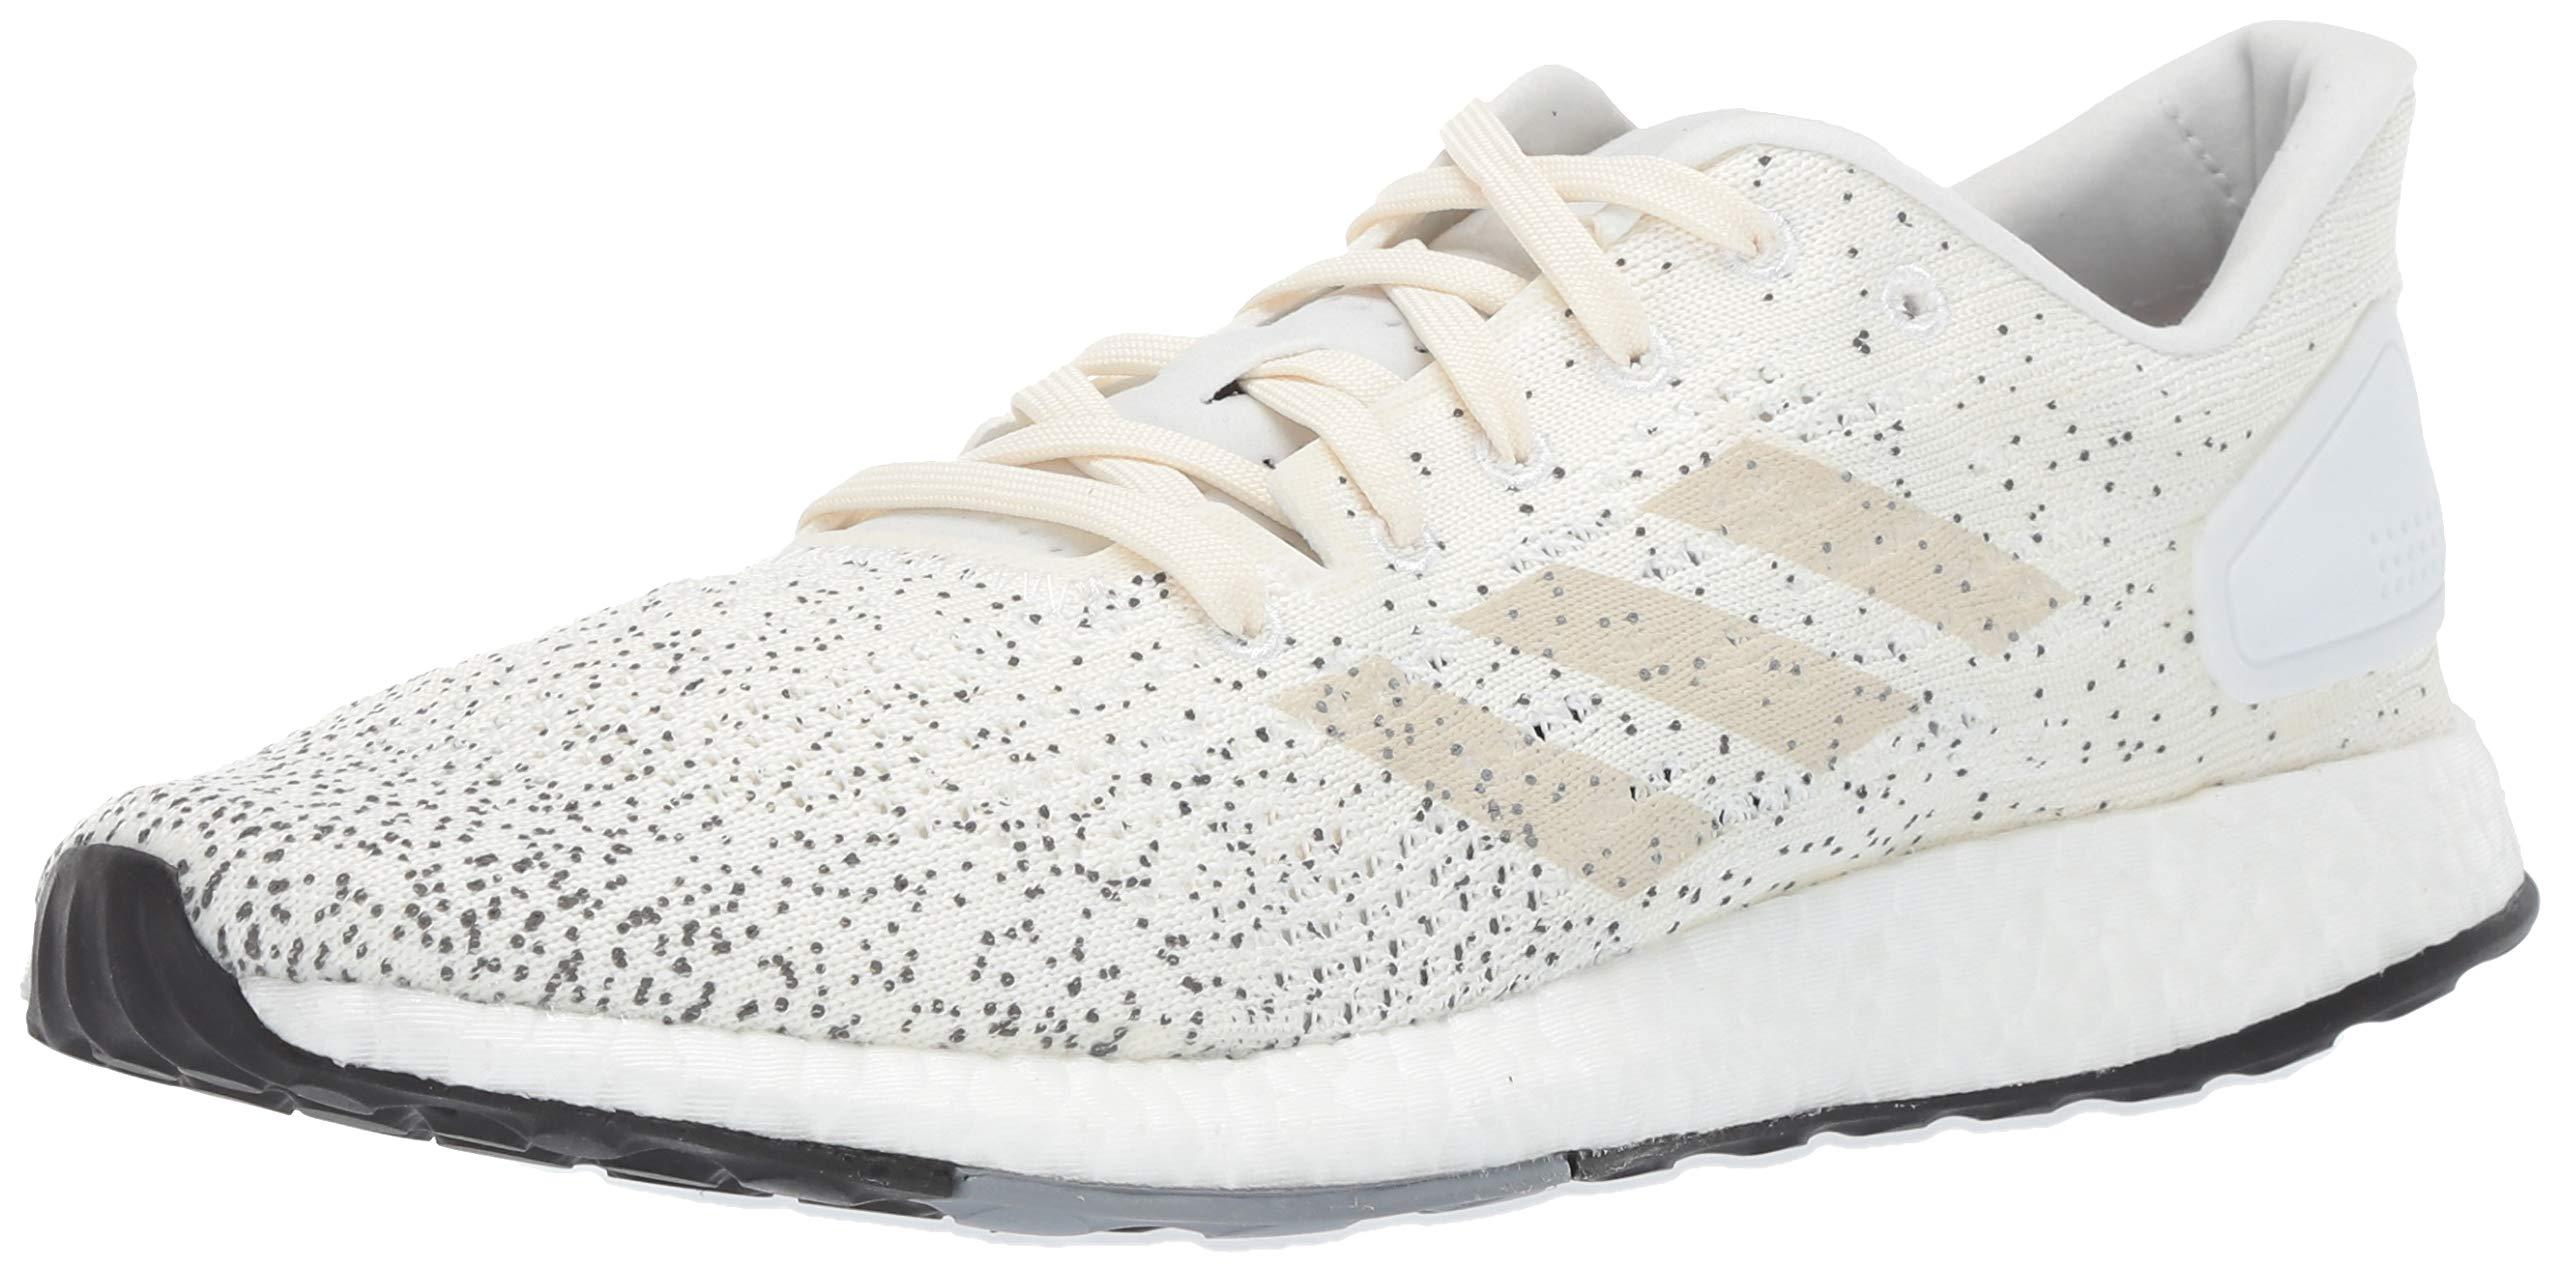 adidas Women's Pureboost DPR Running Shoes, raw White/Grey, 5 M US